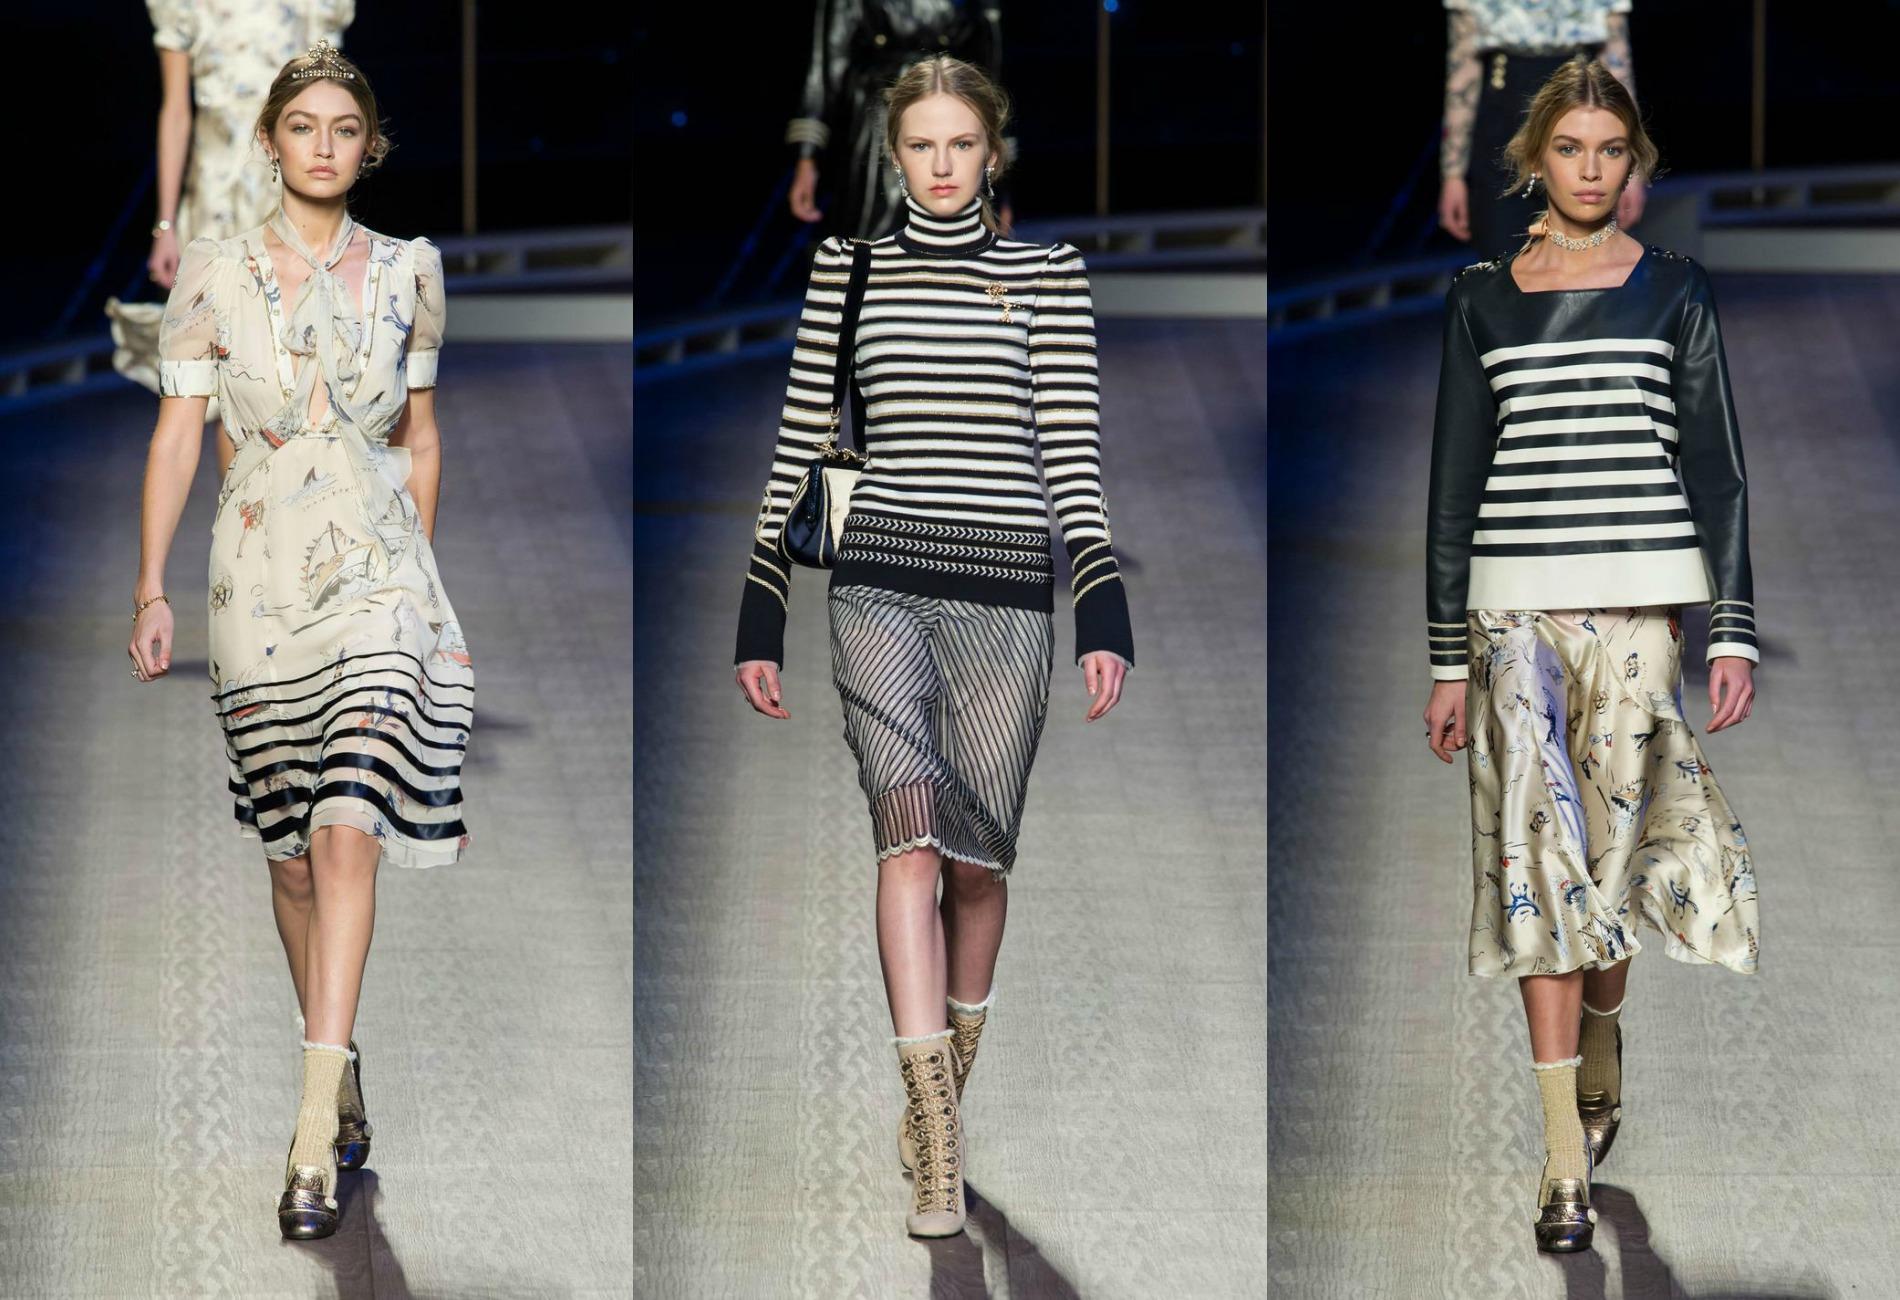 Robes tendances hiver 2017 - Tendance mode automne 2017 ...